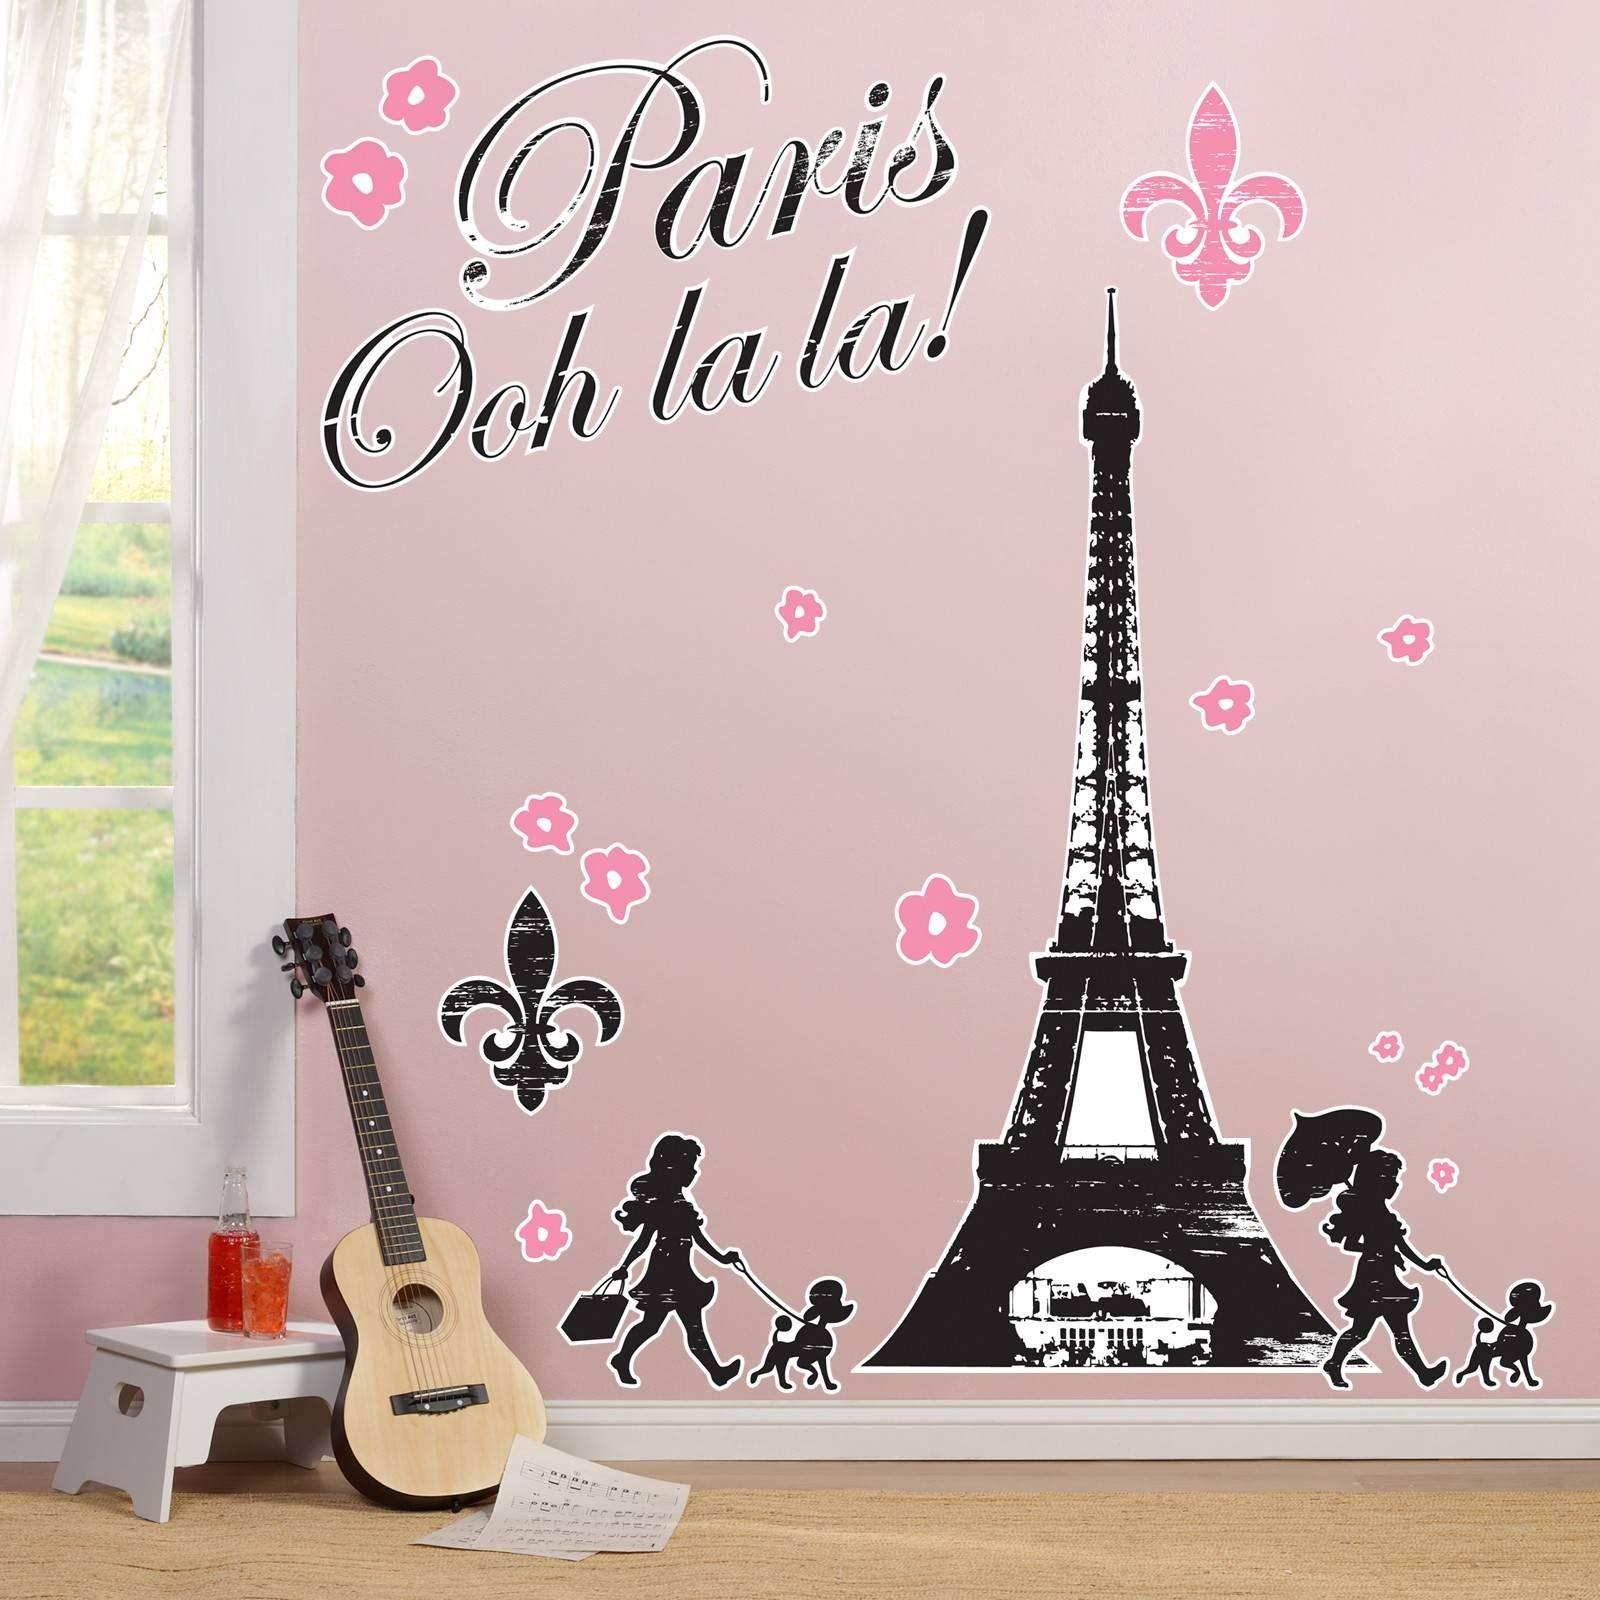 Stupendous Wall Ideas Paris Love Fashion Shopping Wall Decor Regarding Most Popular Paris Theme Nursery Wall Art (View 26 of 30)